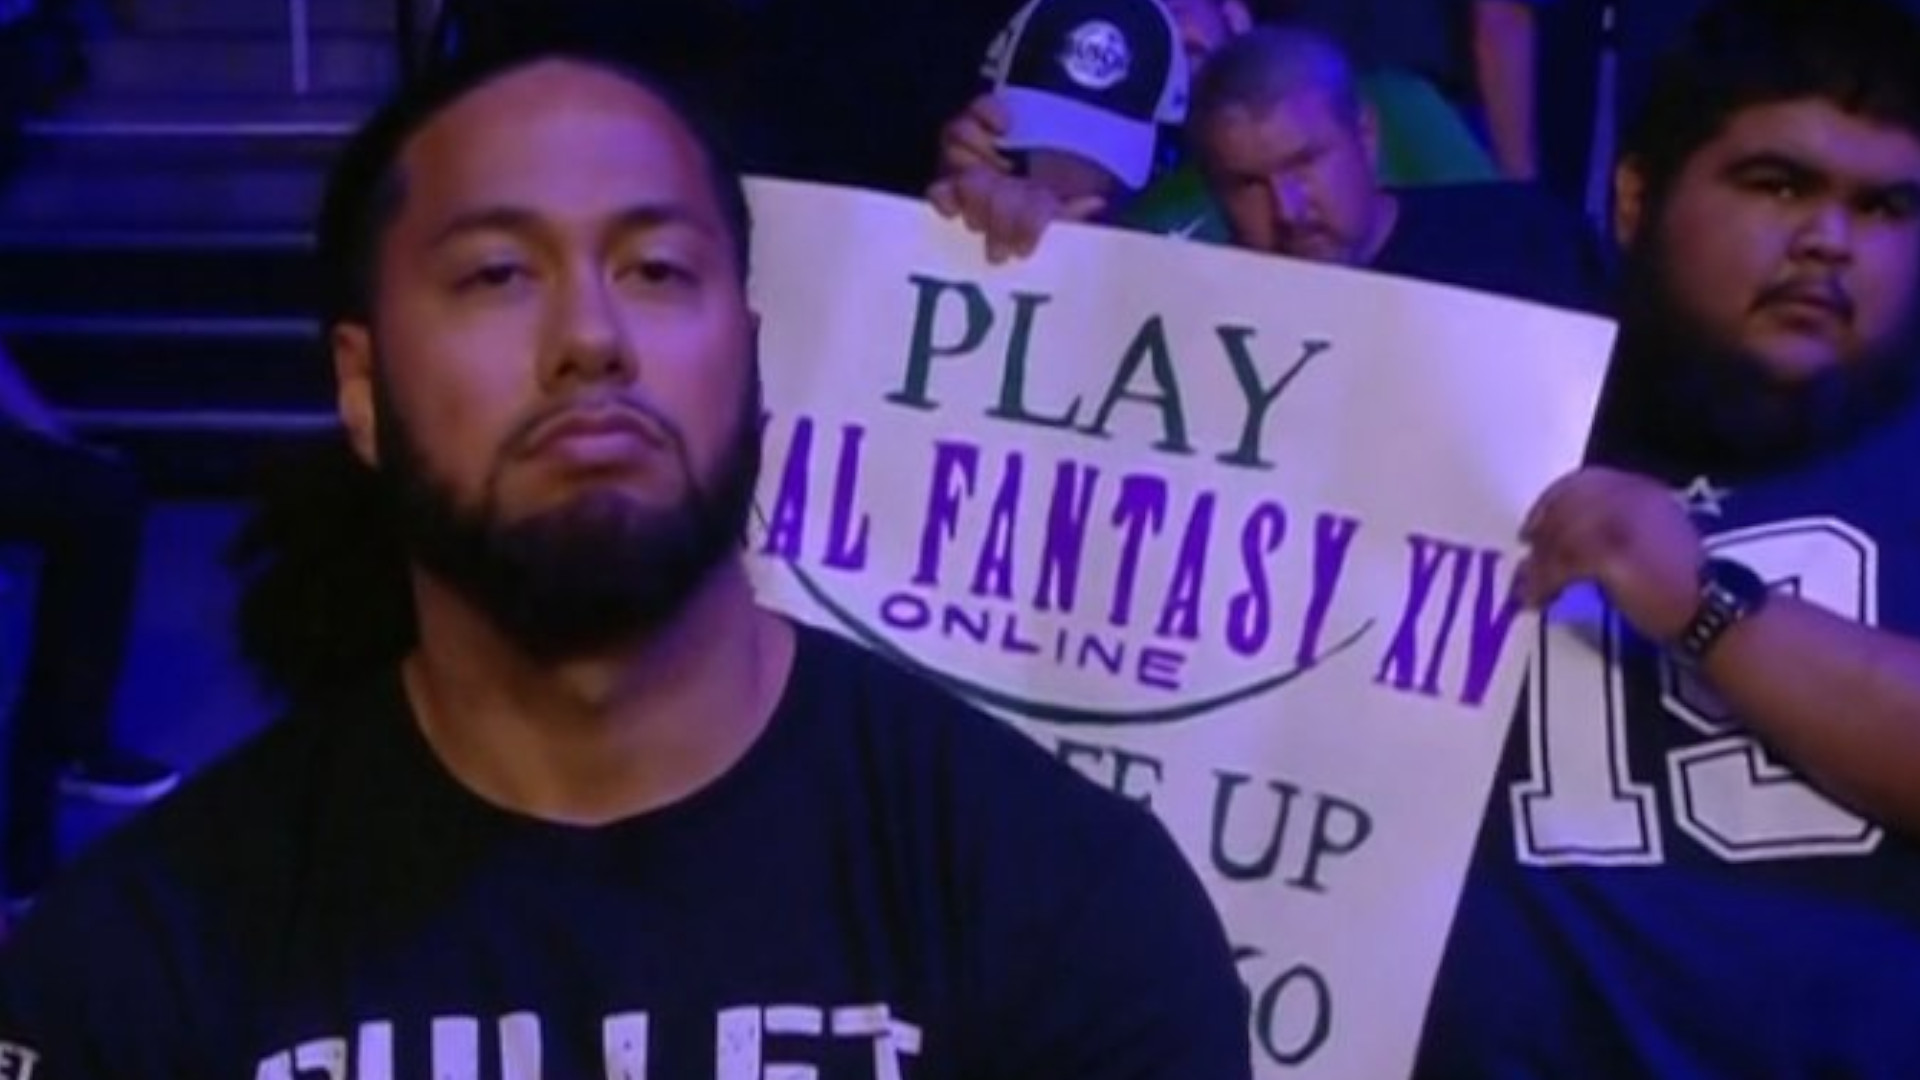 Final Fantasy XIV fan shills the free trial in a wrestling crowd